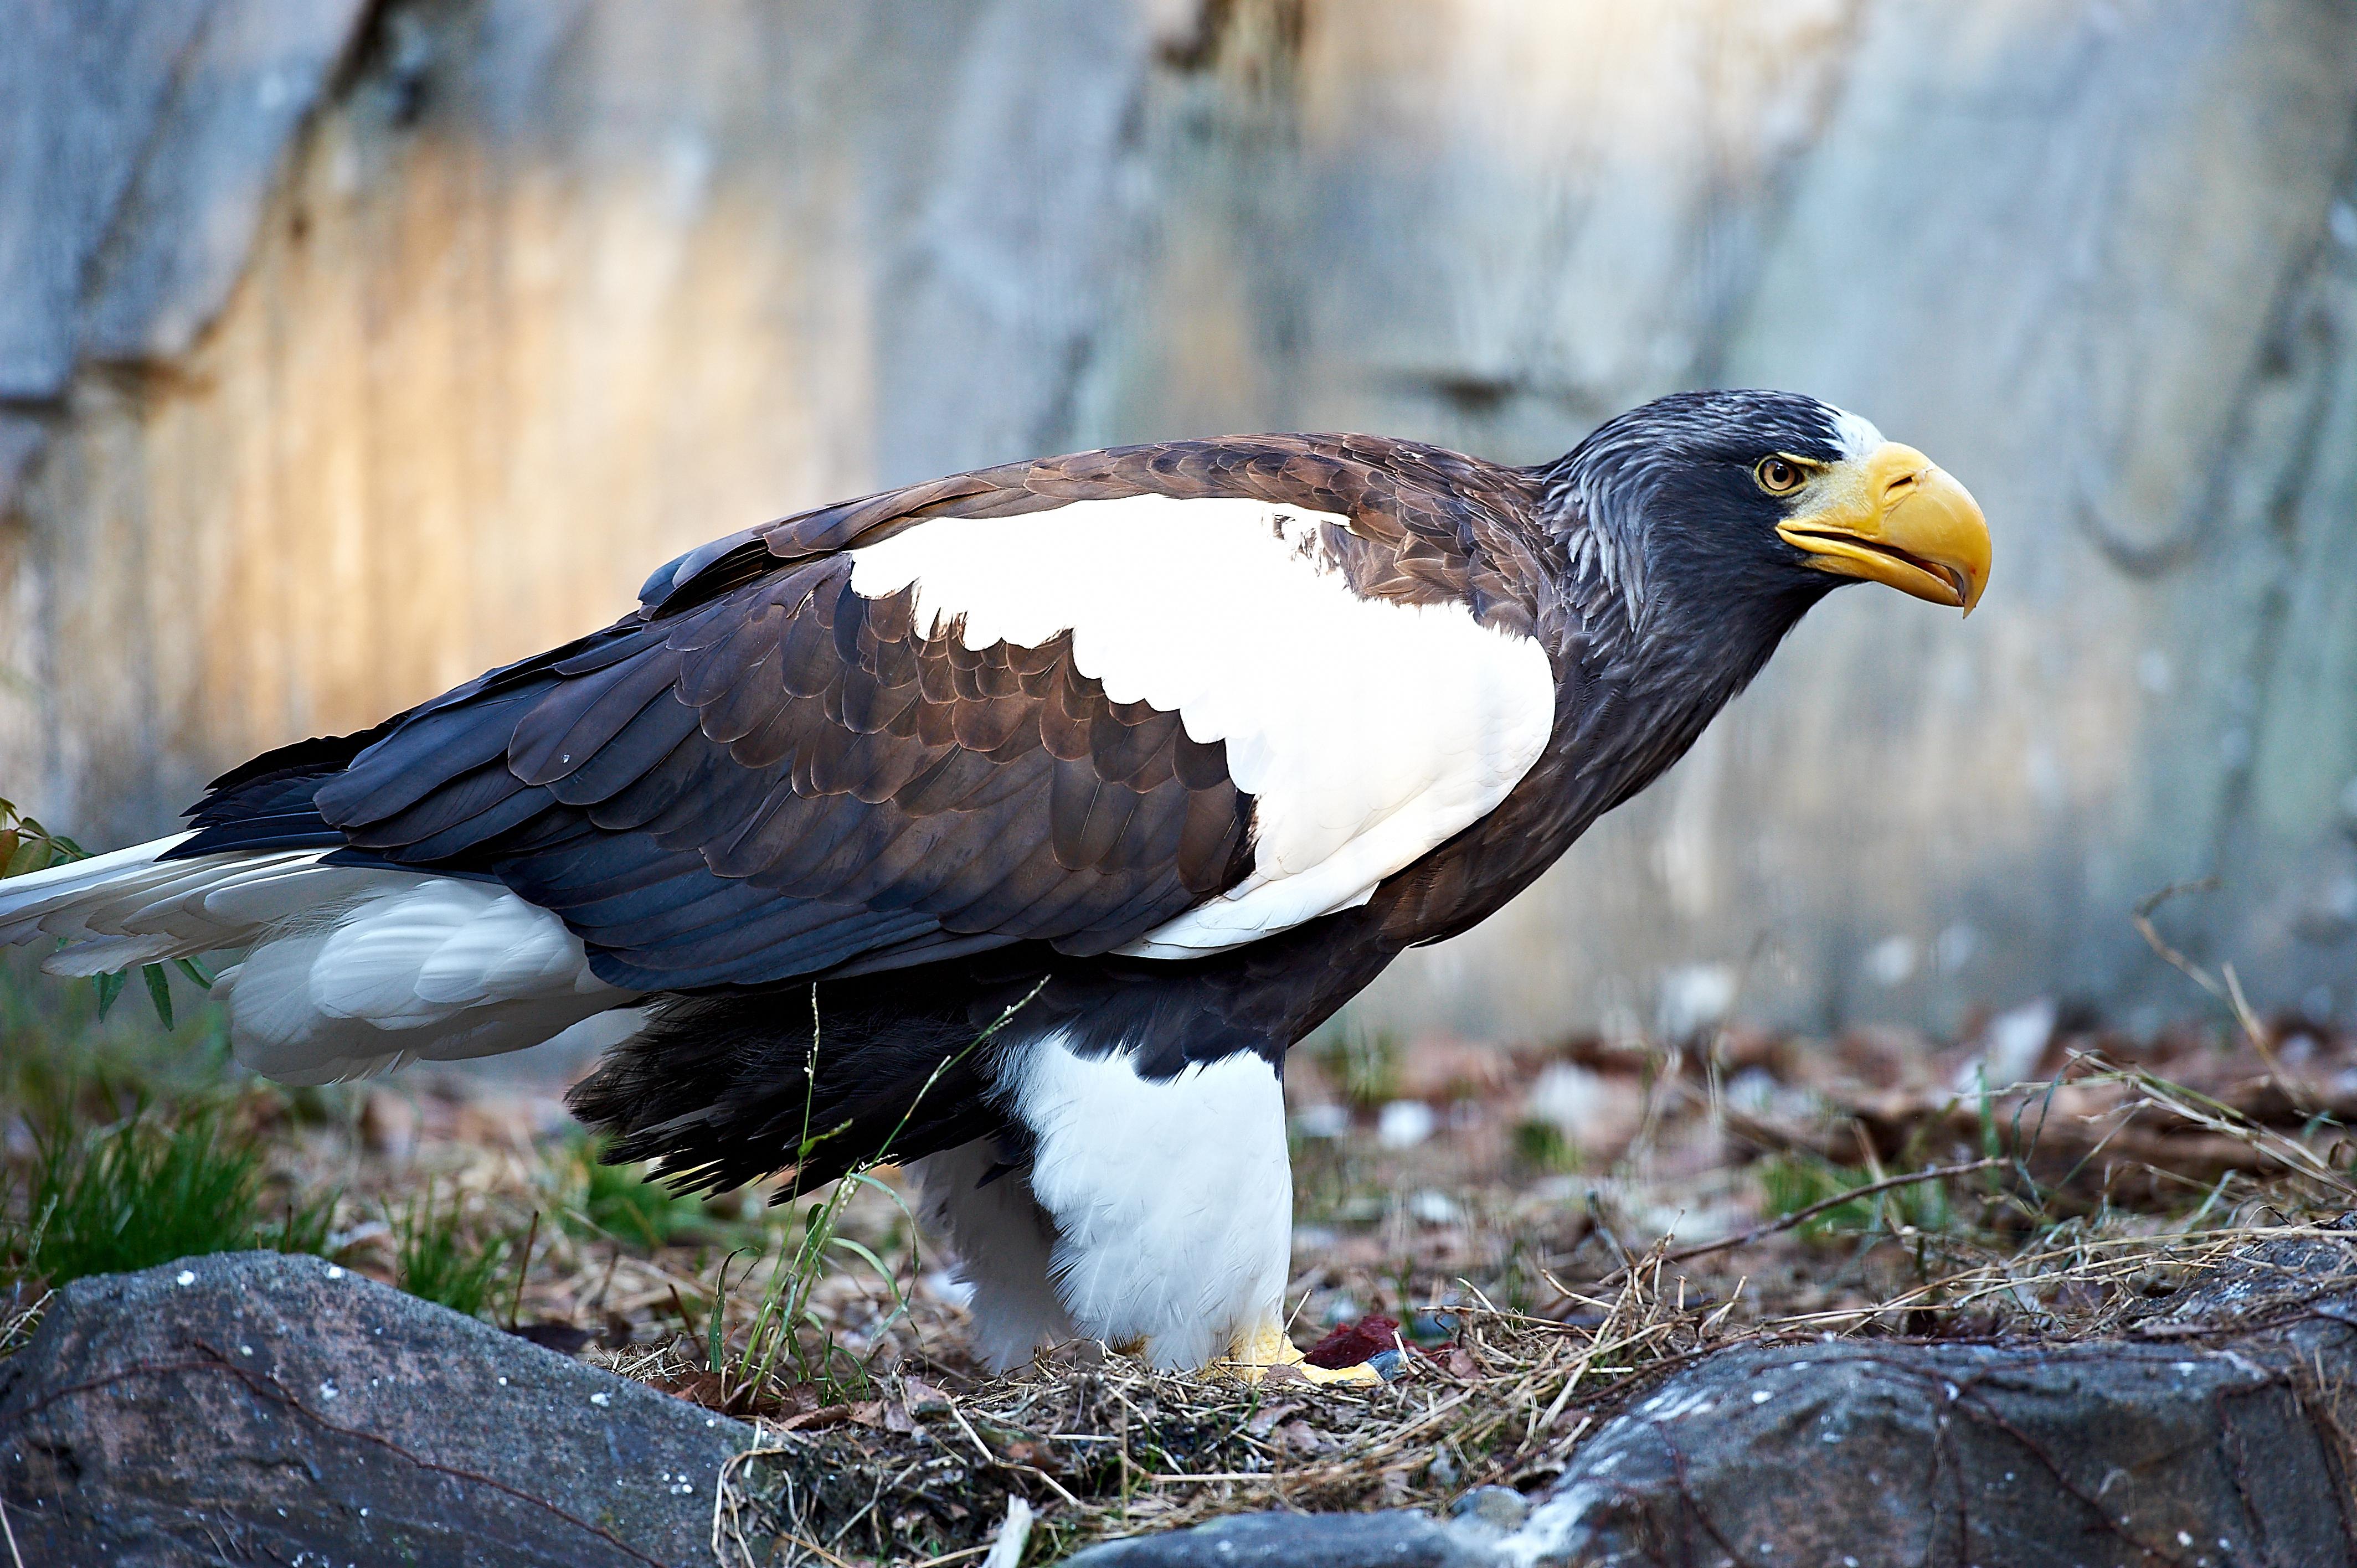 File:Haliaeetus pelagicus -Ueno Zoo, Japan-8a (2).jpg - Wikimedia ...